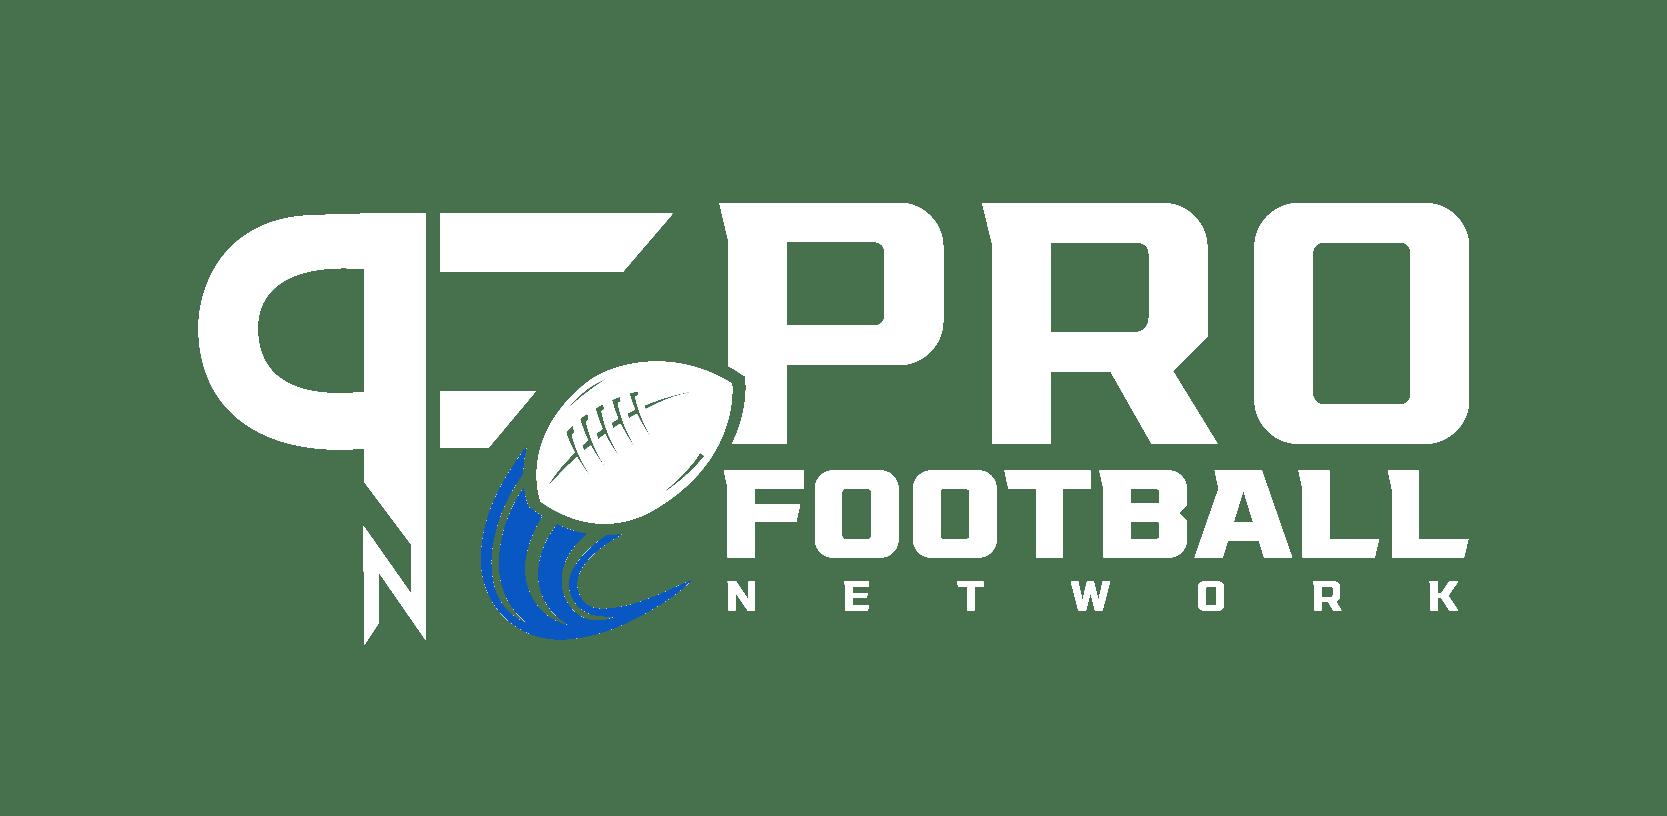 Pro Football Network logo